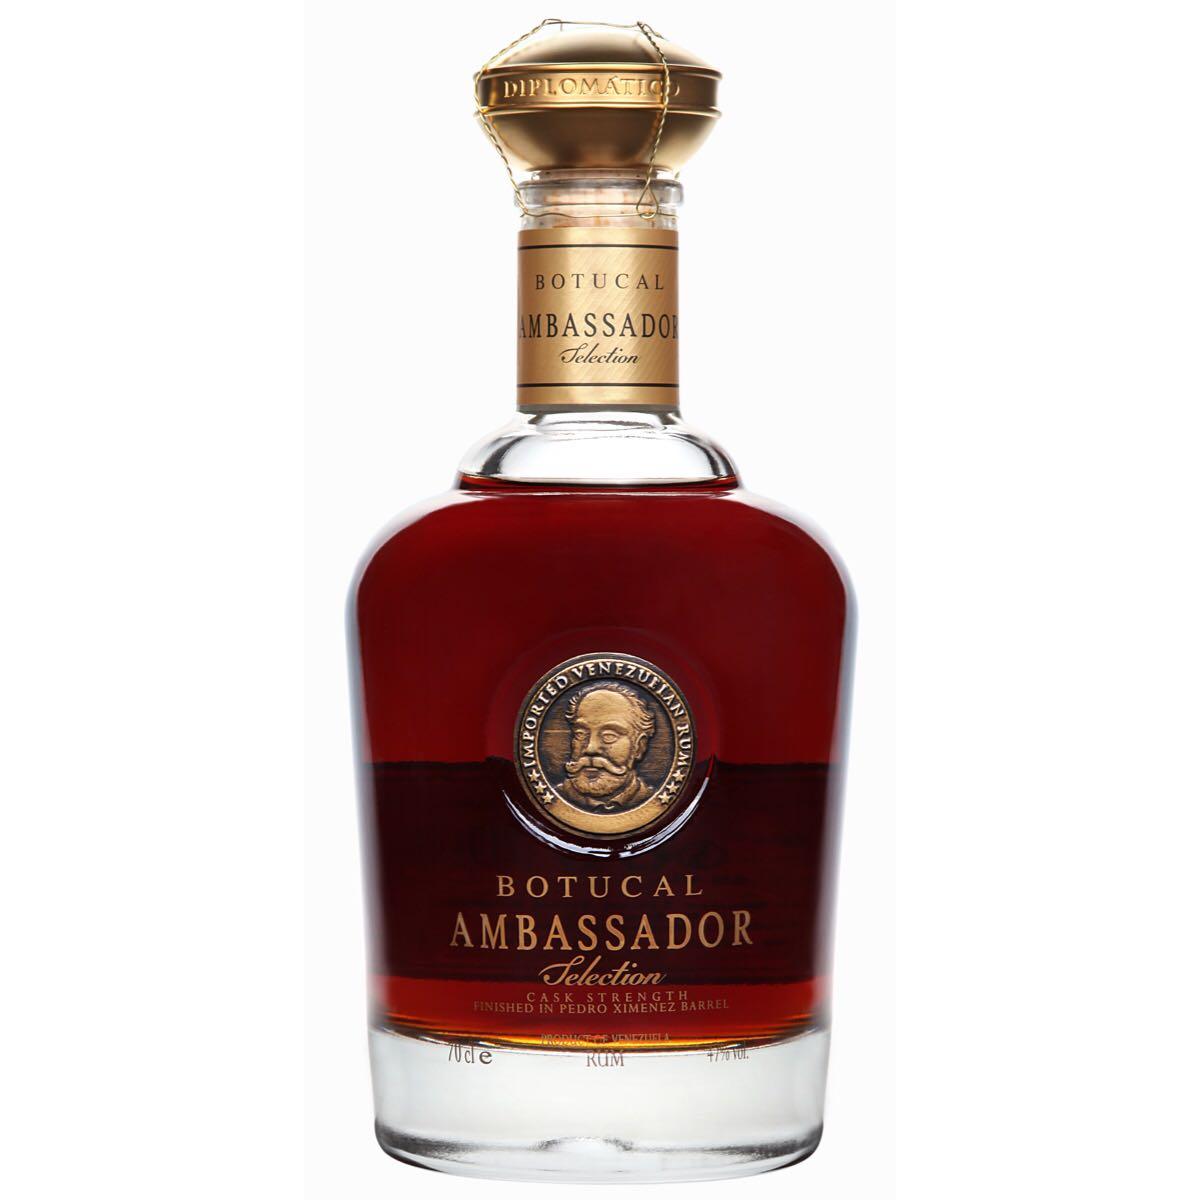 Bottle image of Diplomático / Botucal Ambassador Selection